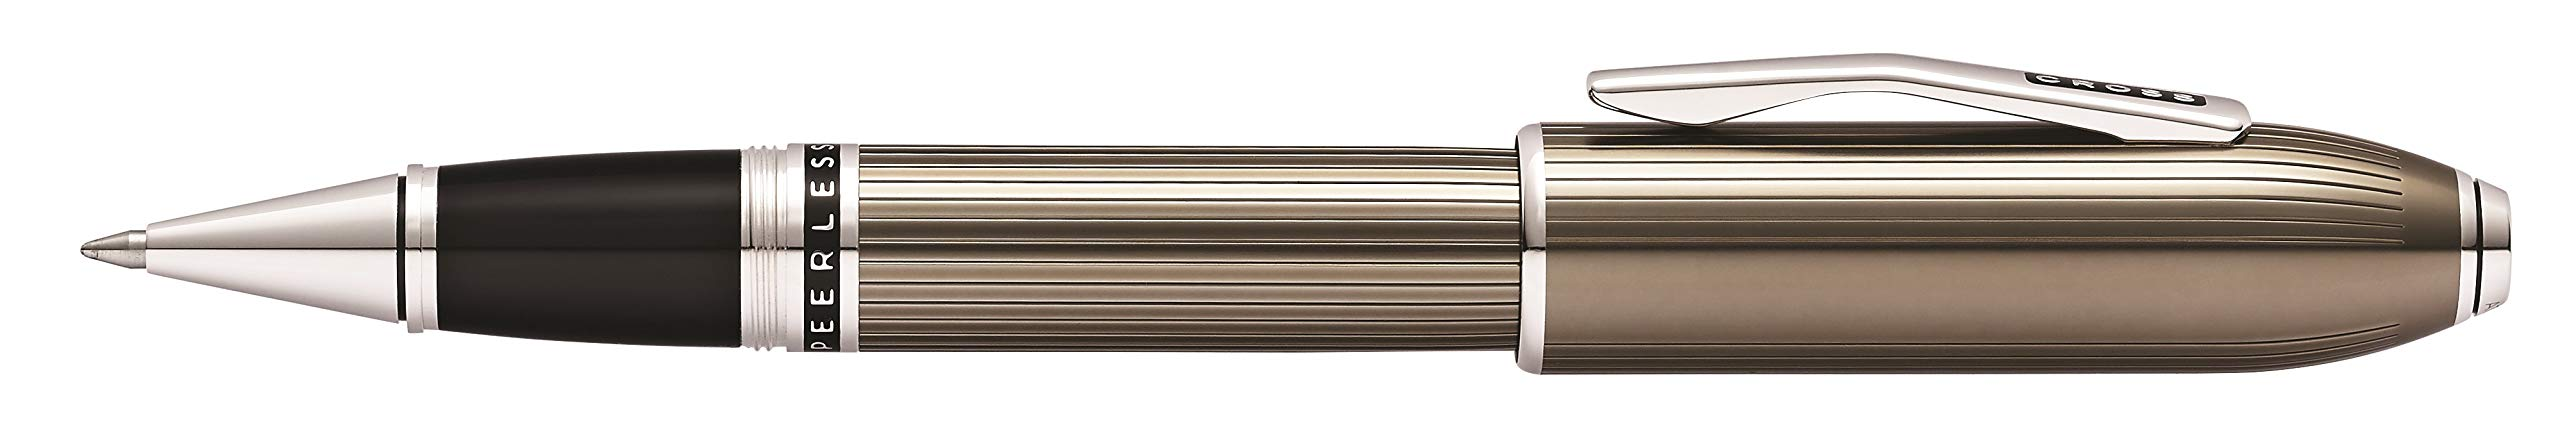 Cross Peerless Translucent Titanium Gray Selectip Rollerball Pen by Cross (Image #2)